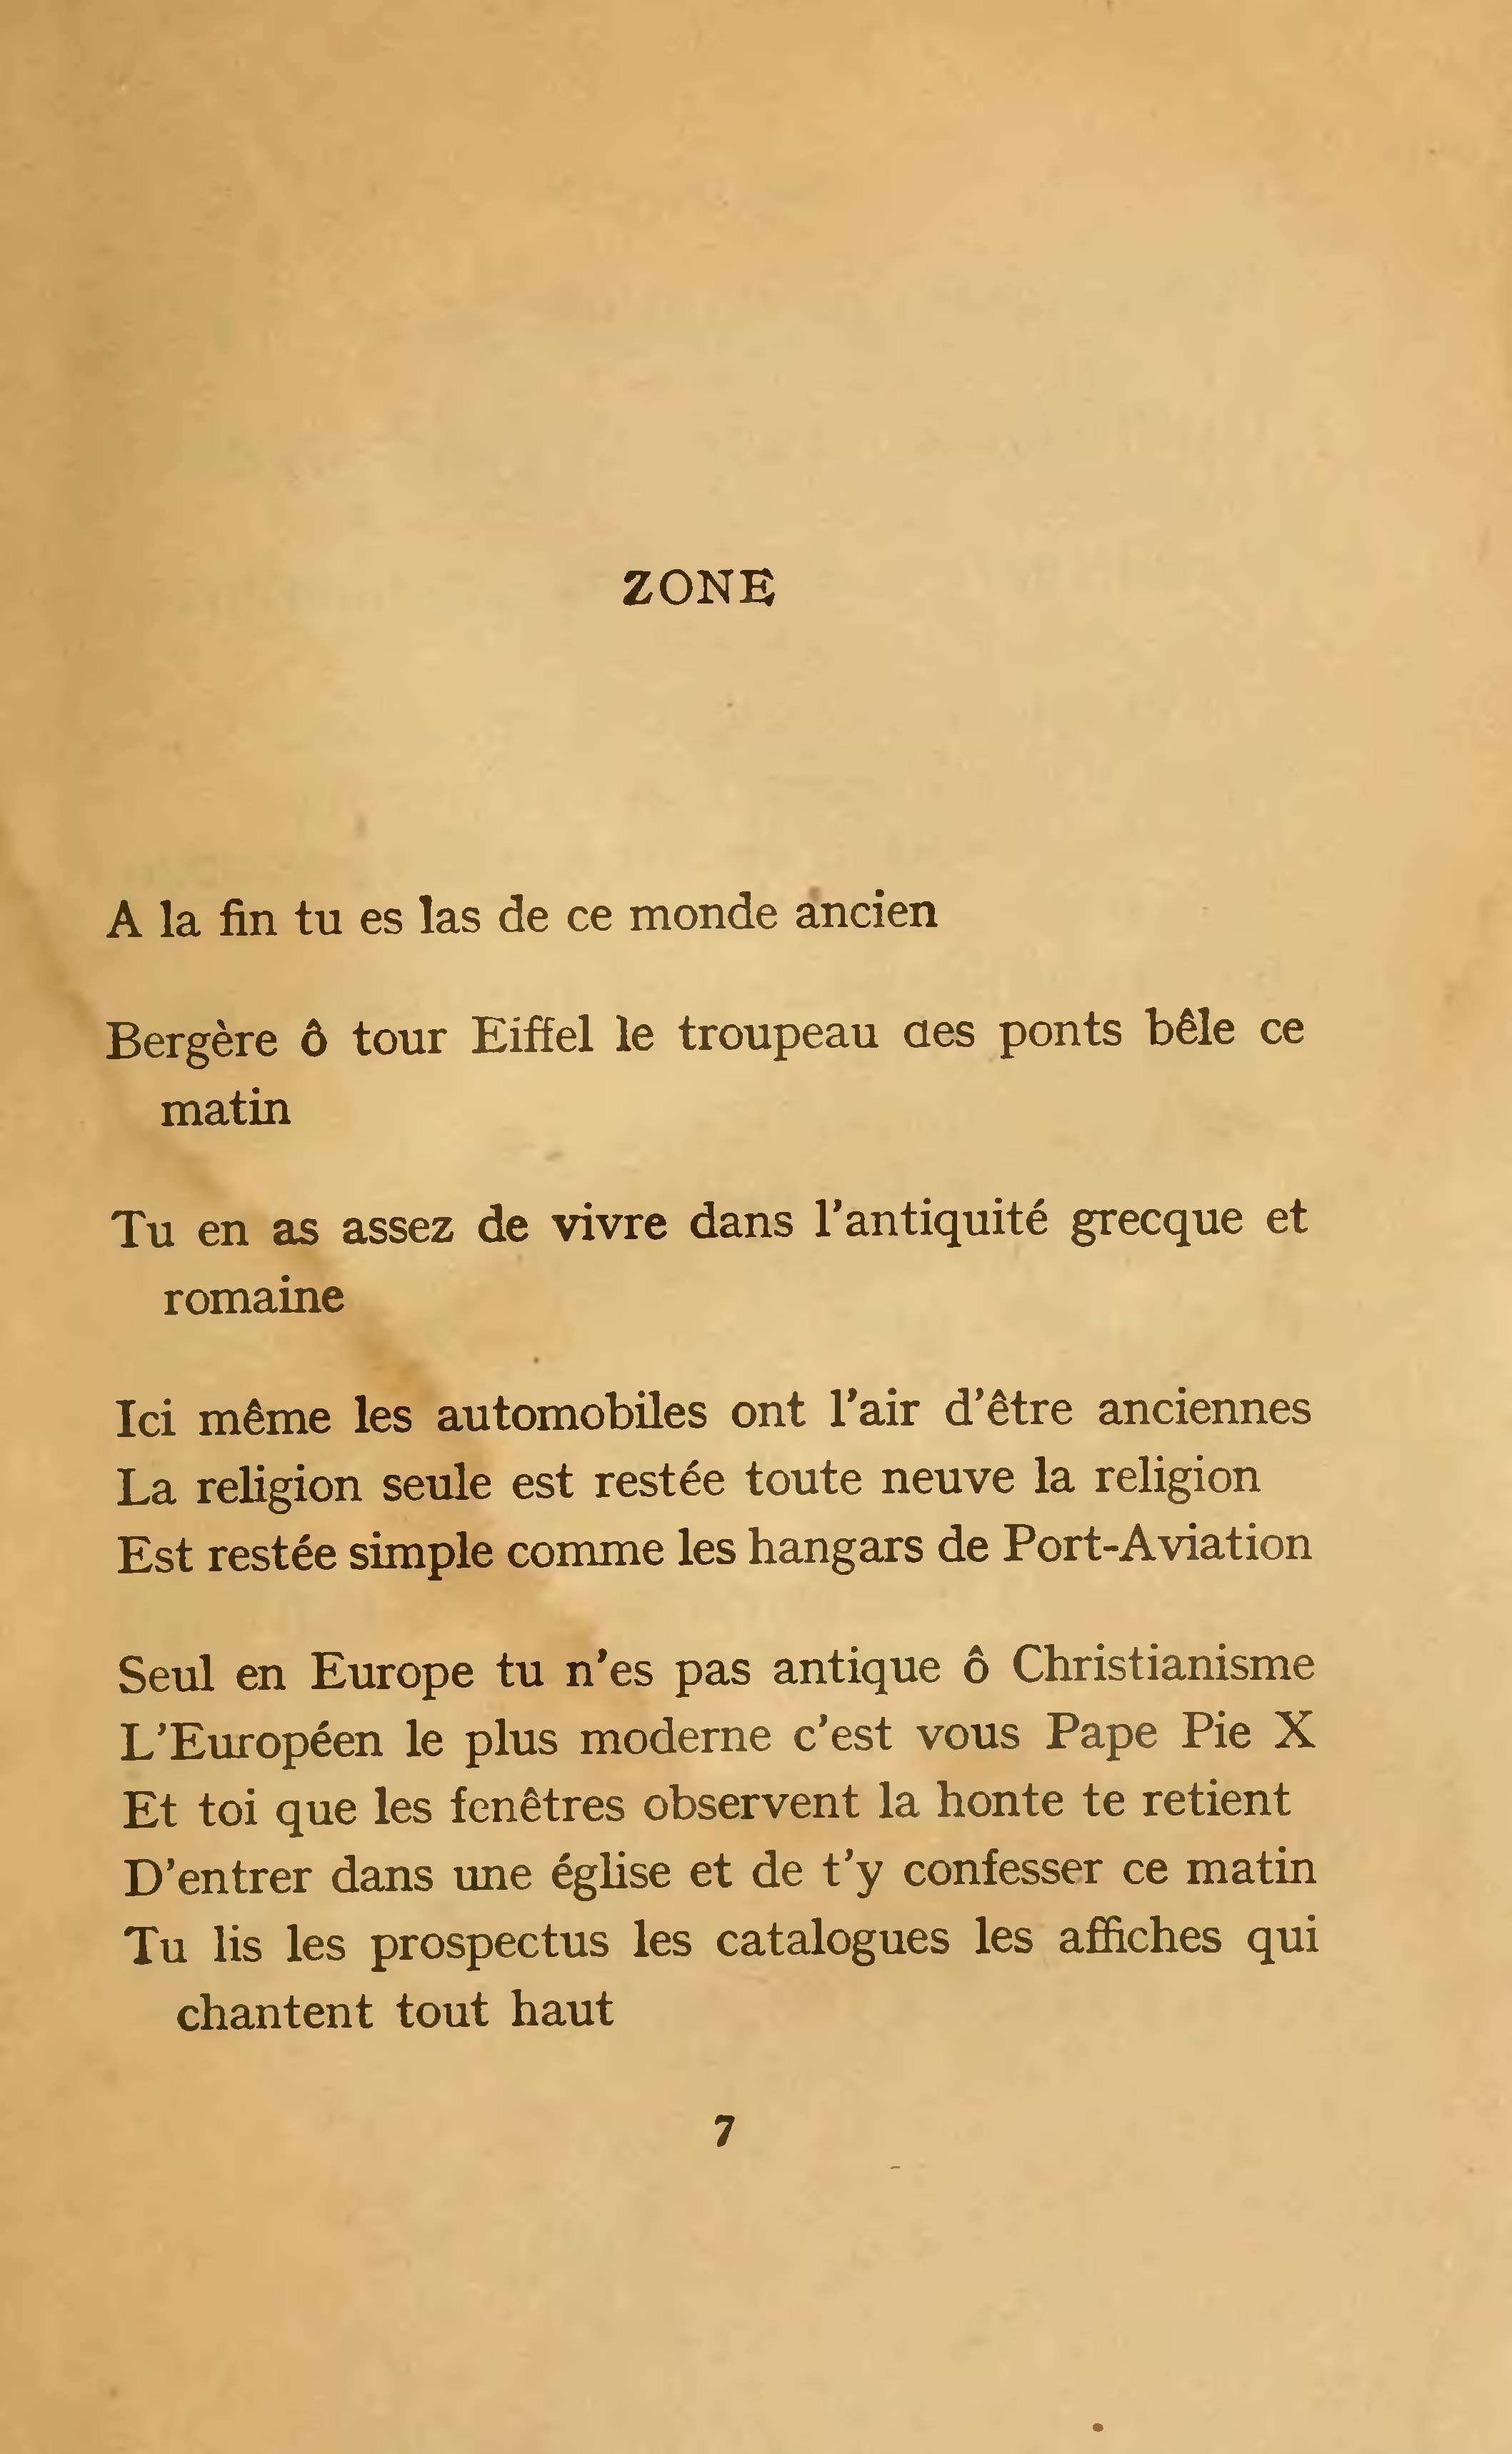 Archivoapollinaire Alcools 1920djvu Wikipedia La